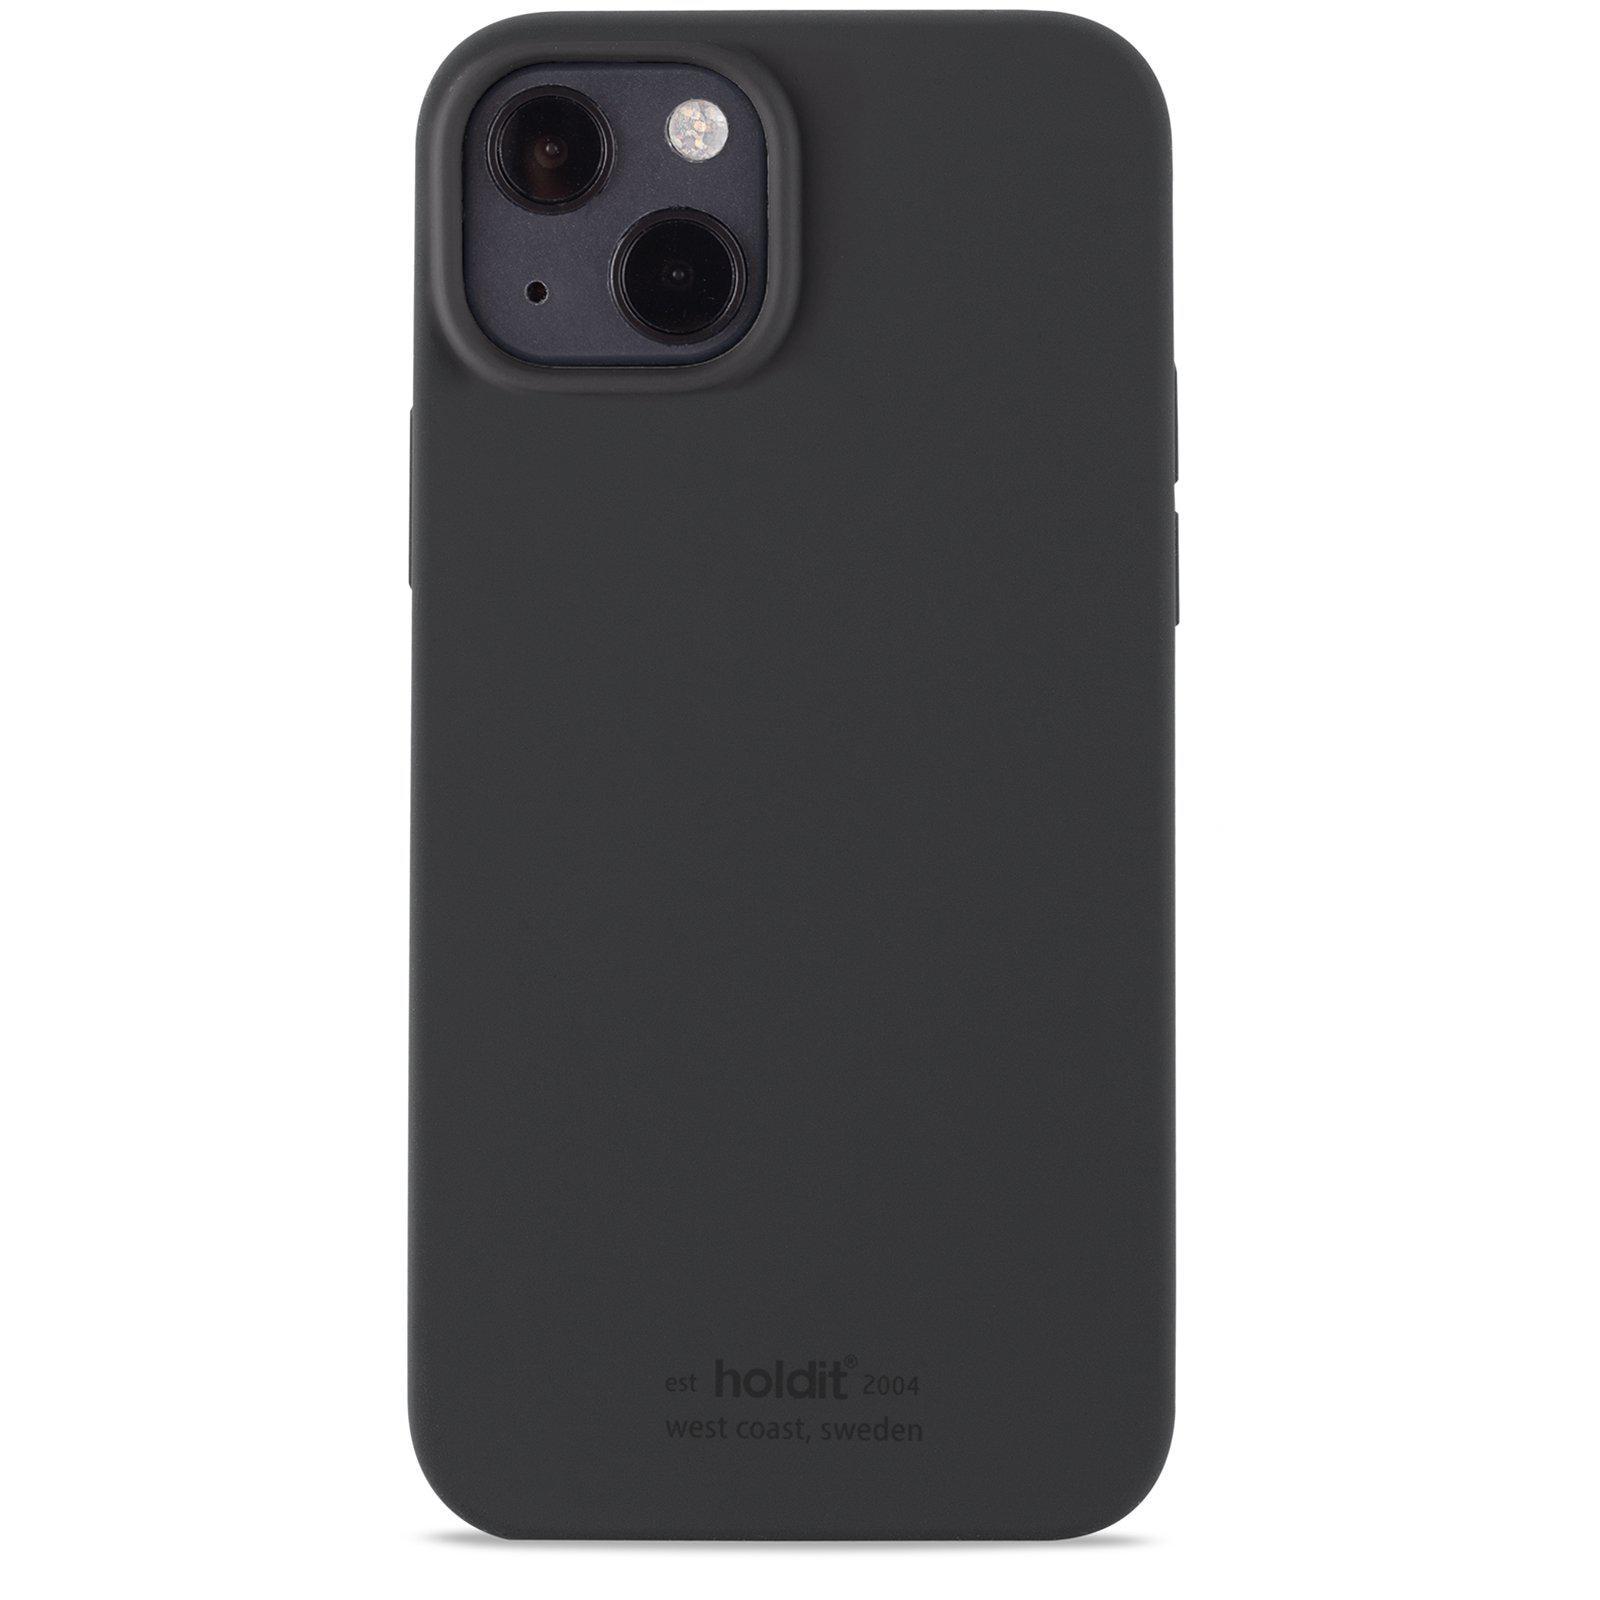 Silikonikuori iPhone 13 Mini Musta